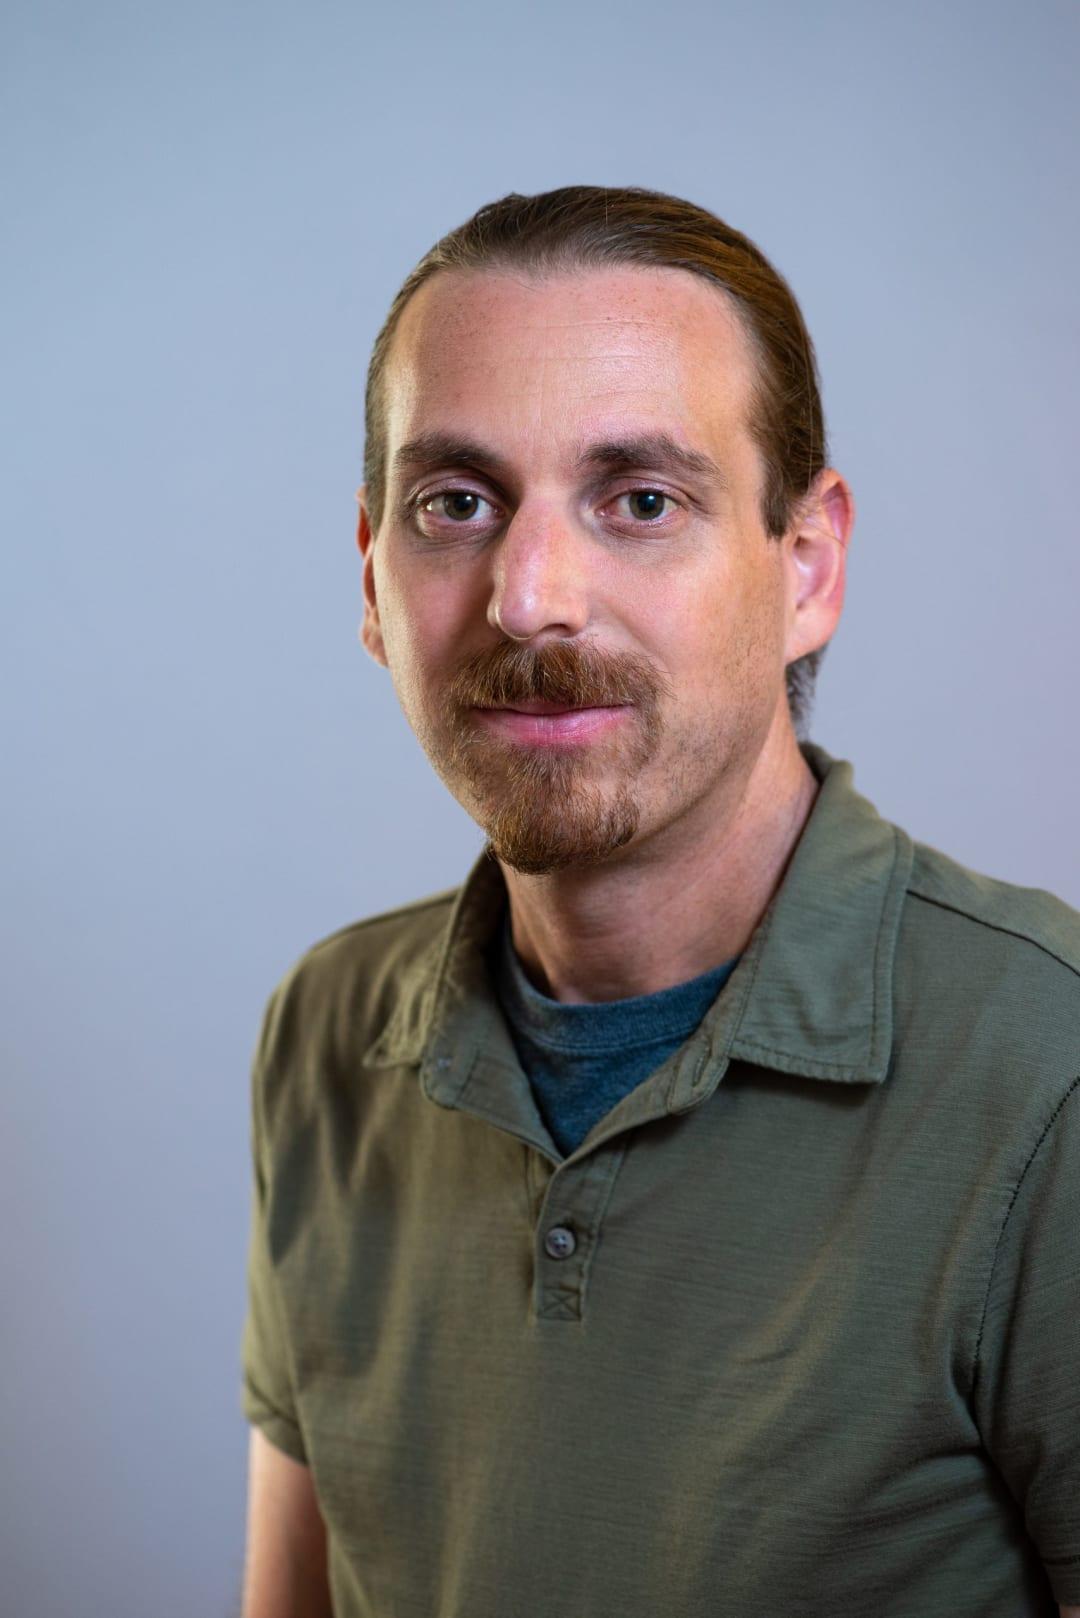 Springboard mentor Neal Fultz